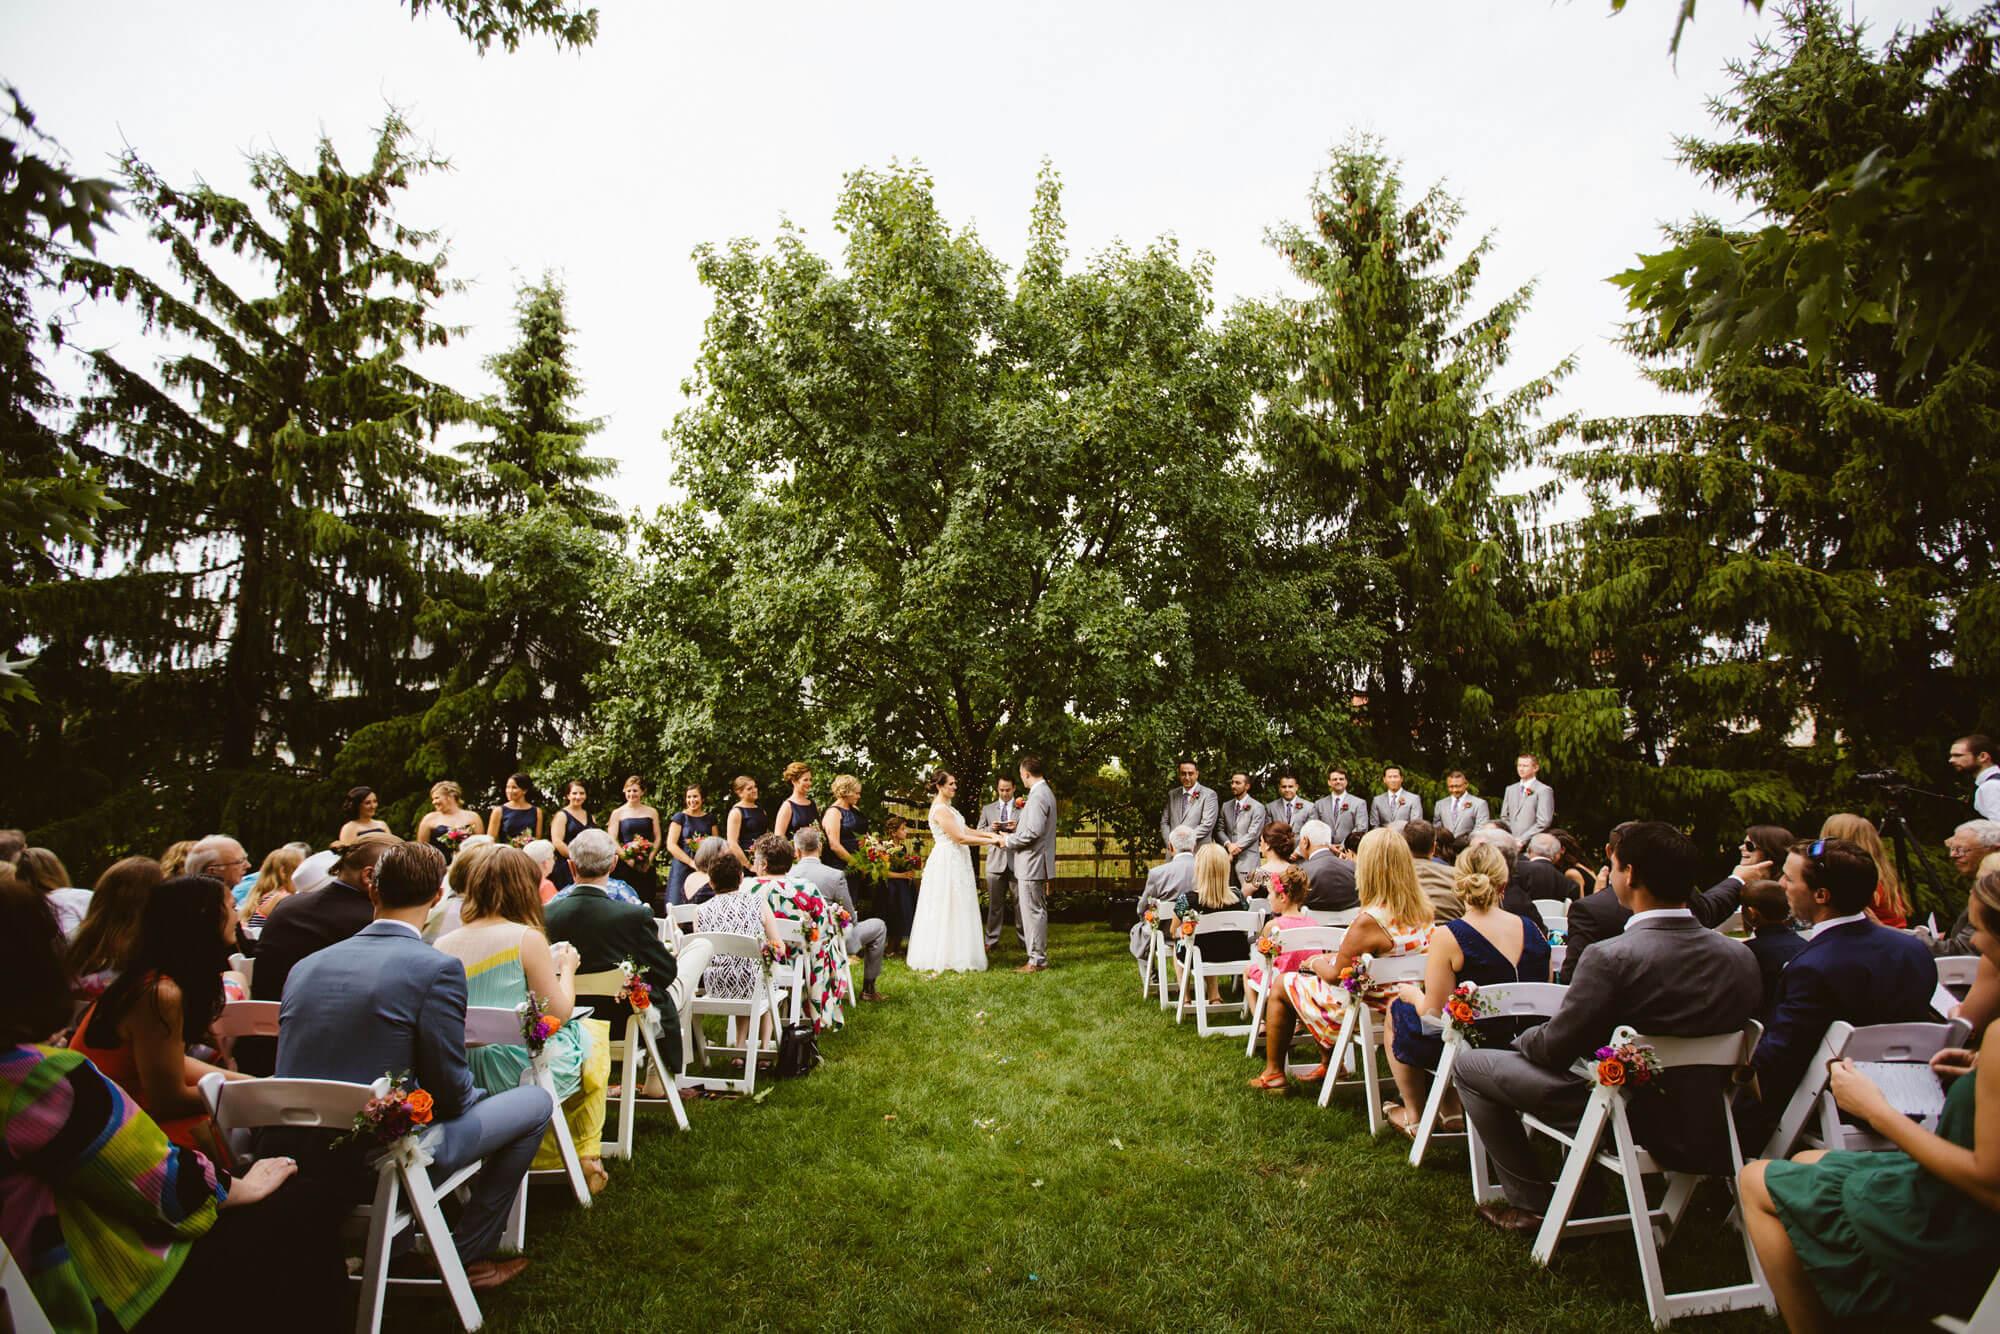 Erica-Kay-Photography---Kate-_-Joe-Wedding-21.jpg